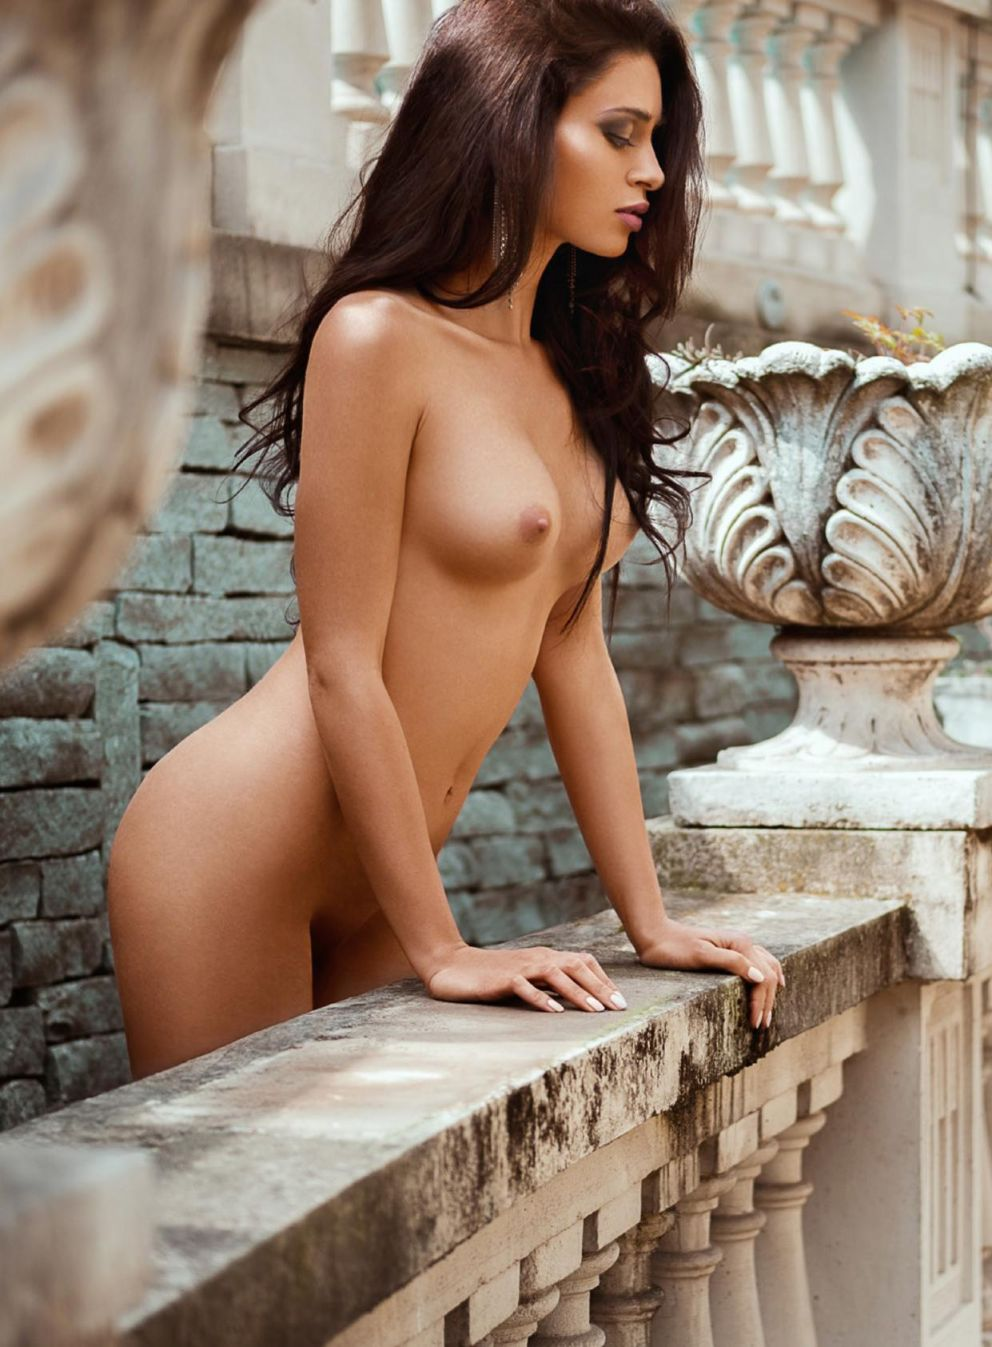 Lascivious brunette nude